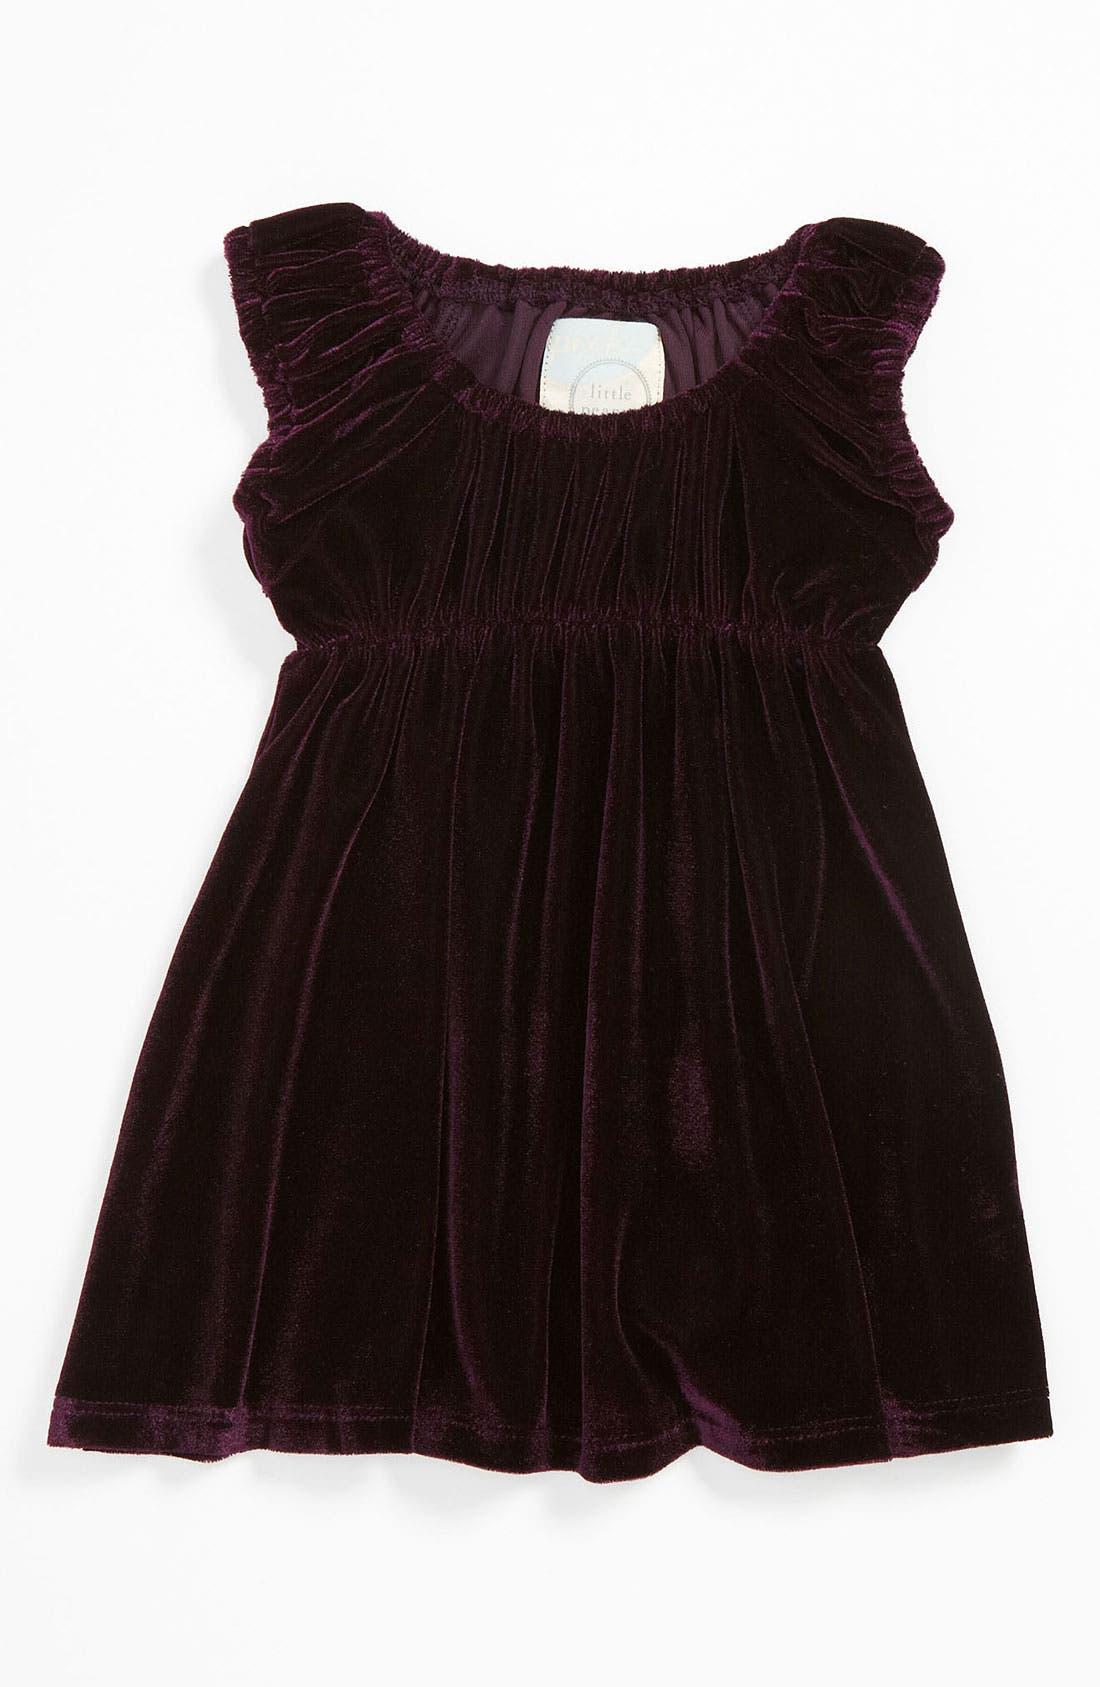 Main Image - Peek 'Kate' Dress (Infant)